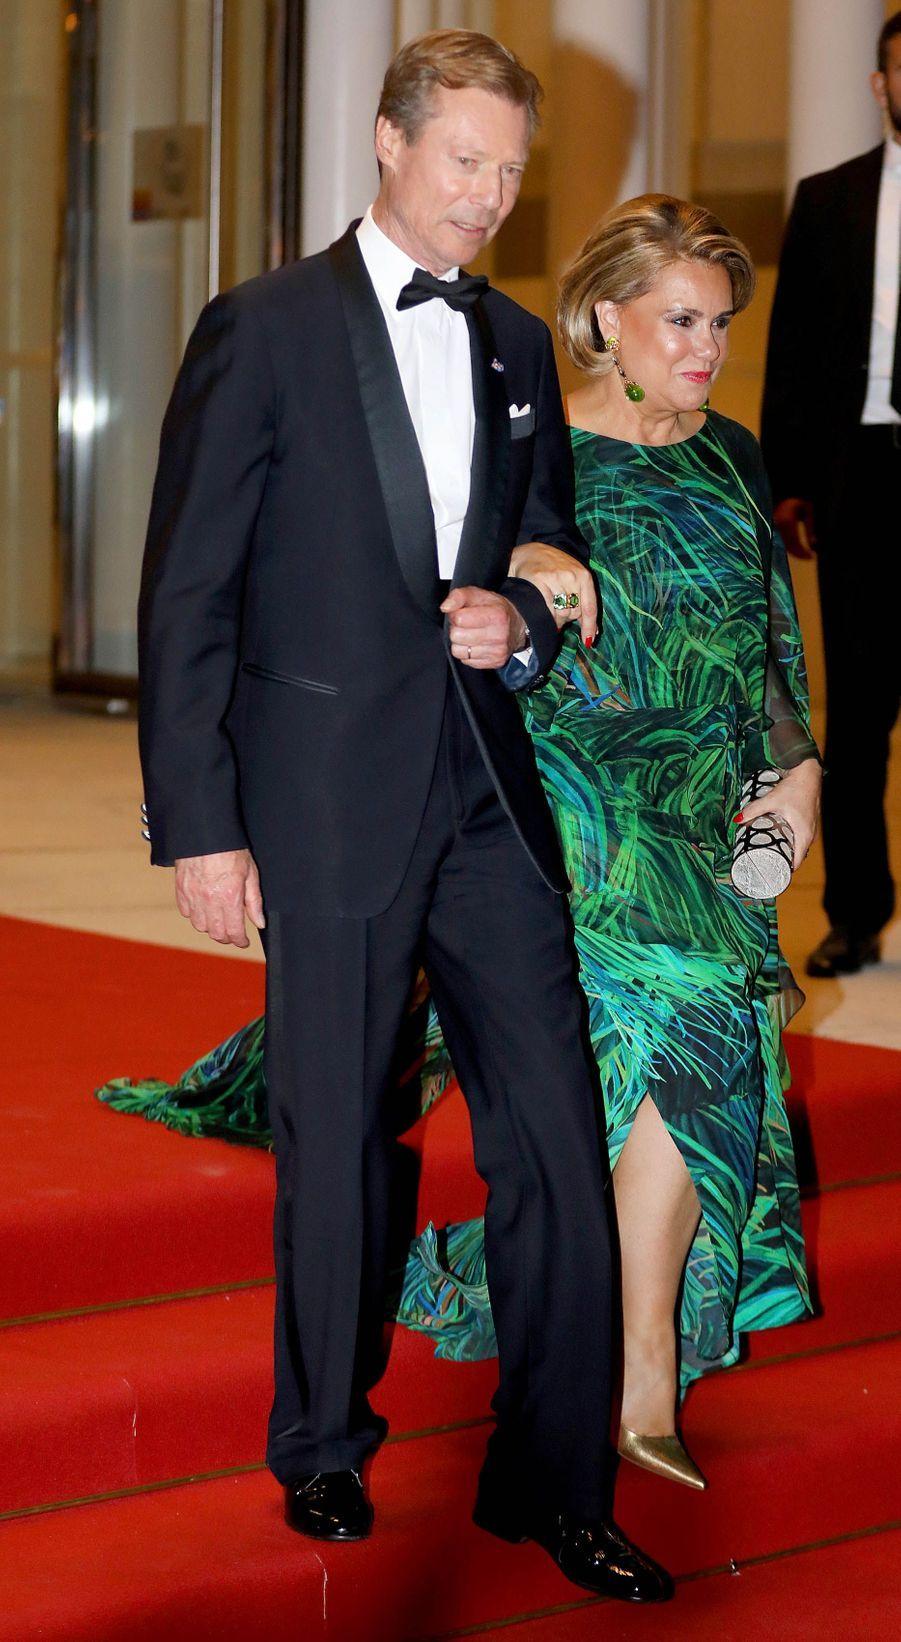 Le grand-duc Henri et la grande-duchesse Maria Teresa de Luxembourg à Luxembourg, le 24 mai 2018